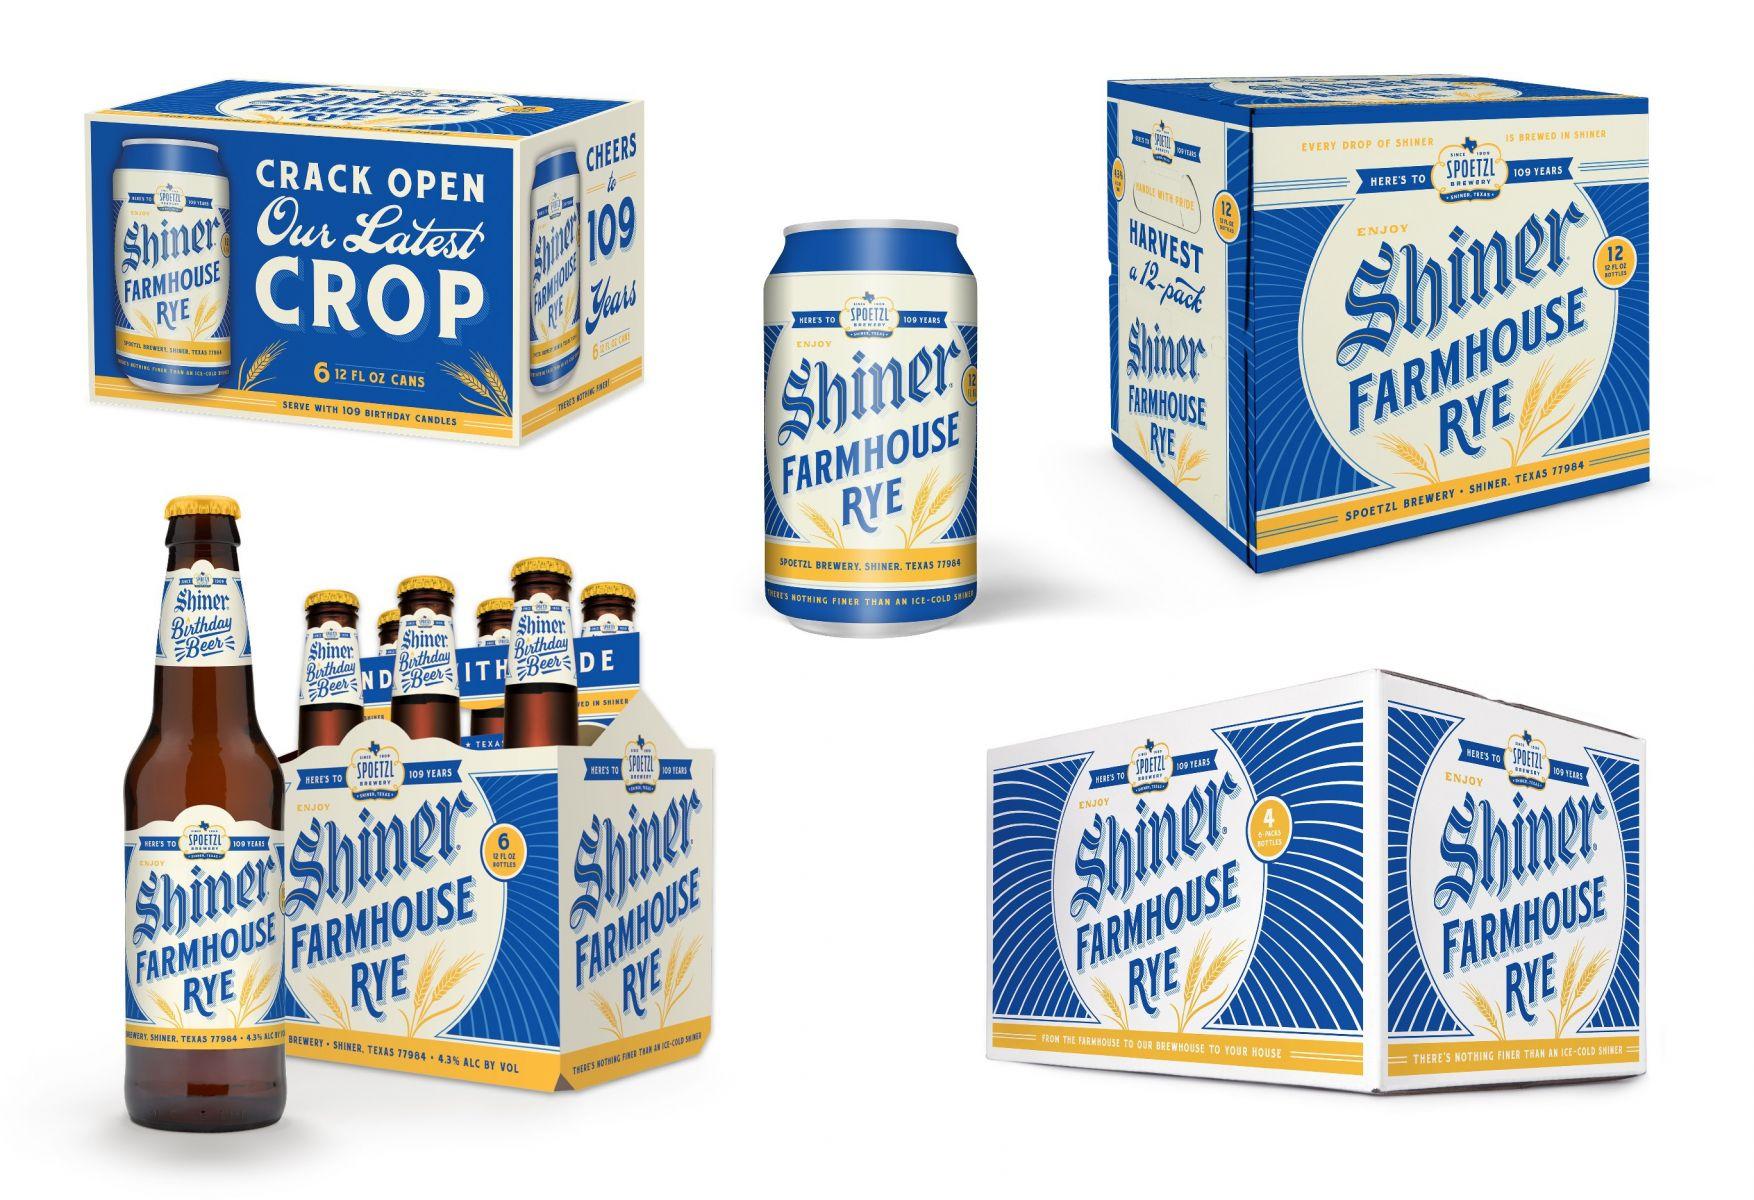 Farmhouse_Rye_Packaging-01_2-2